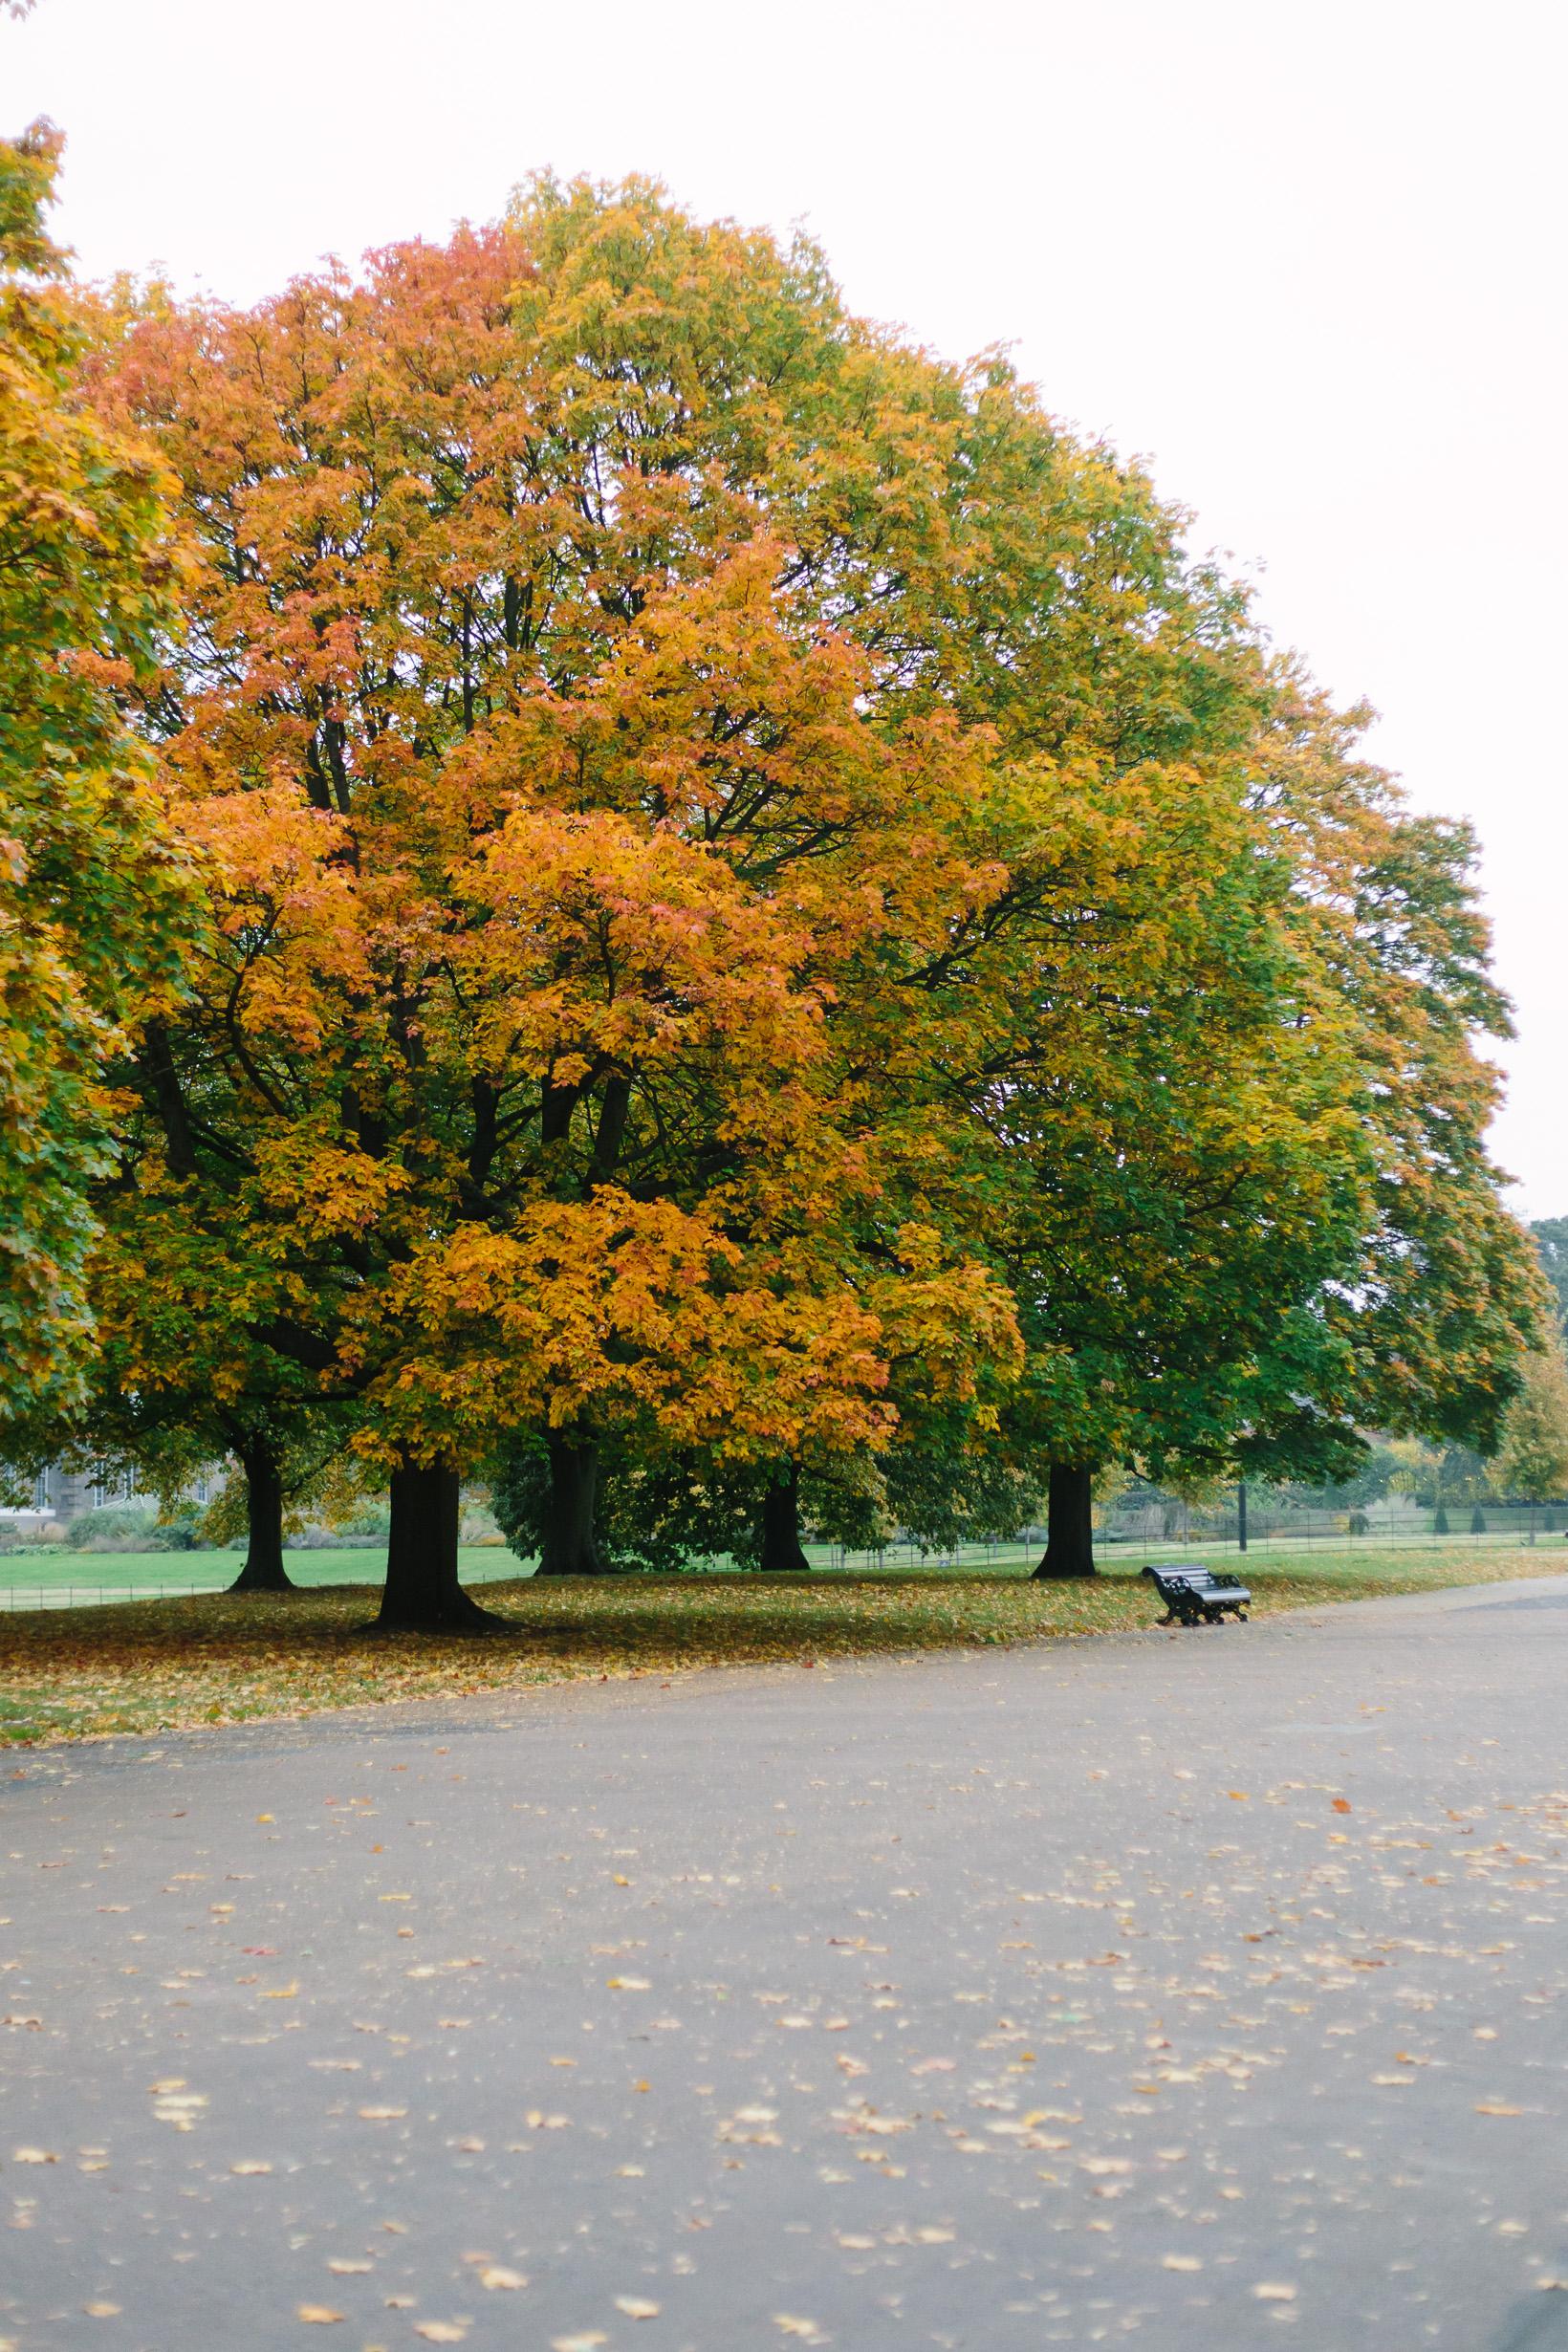 fall-in-hyde-park-london-4107